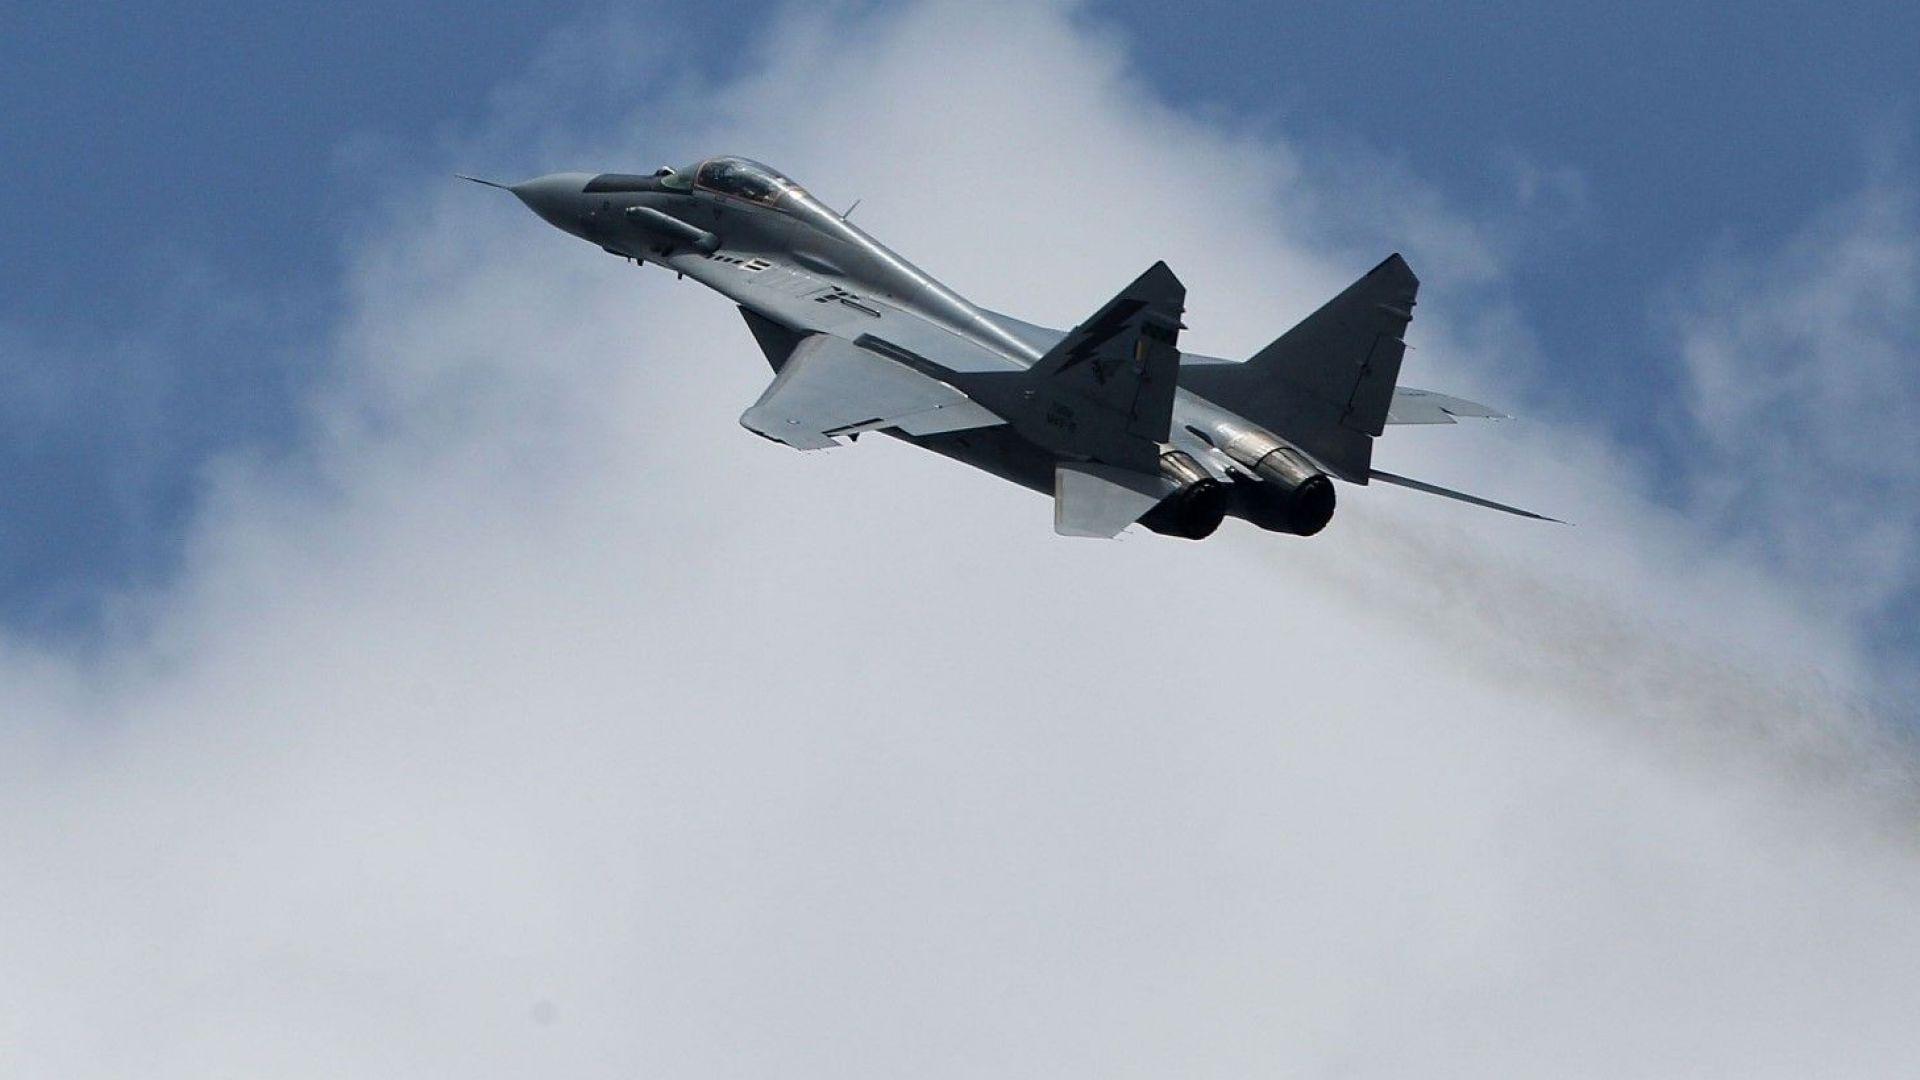 Одобрено е финансиране за ремонт на военните самолети